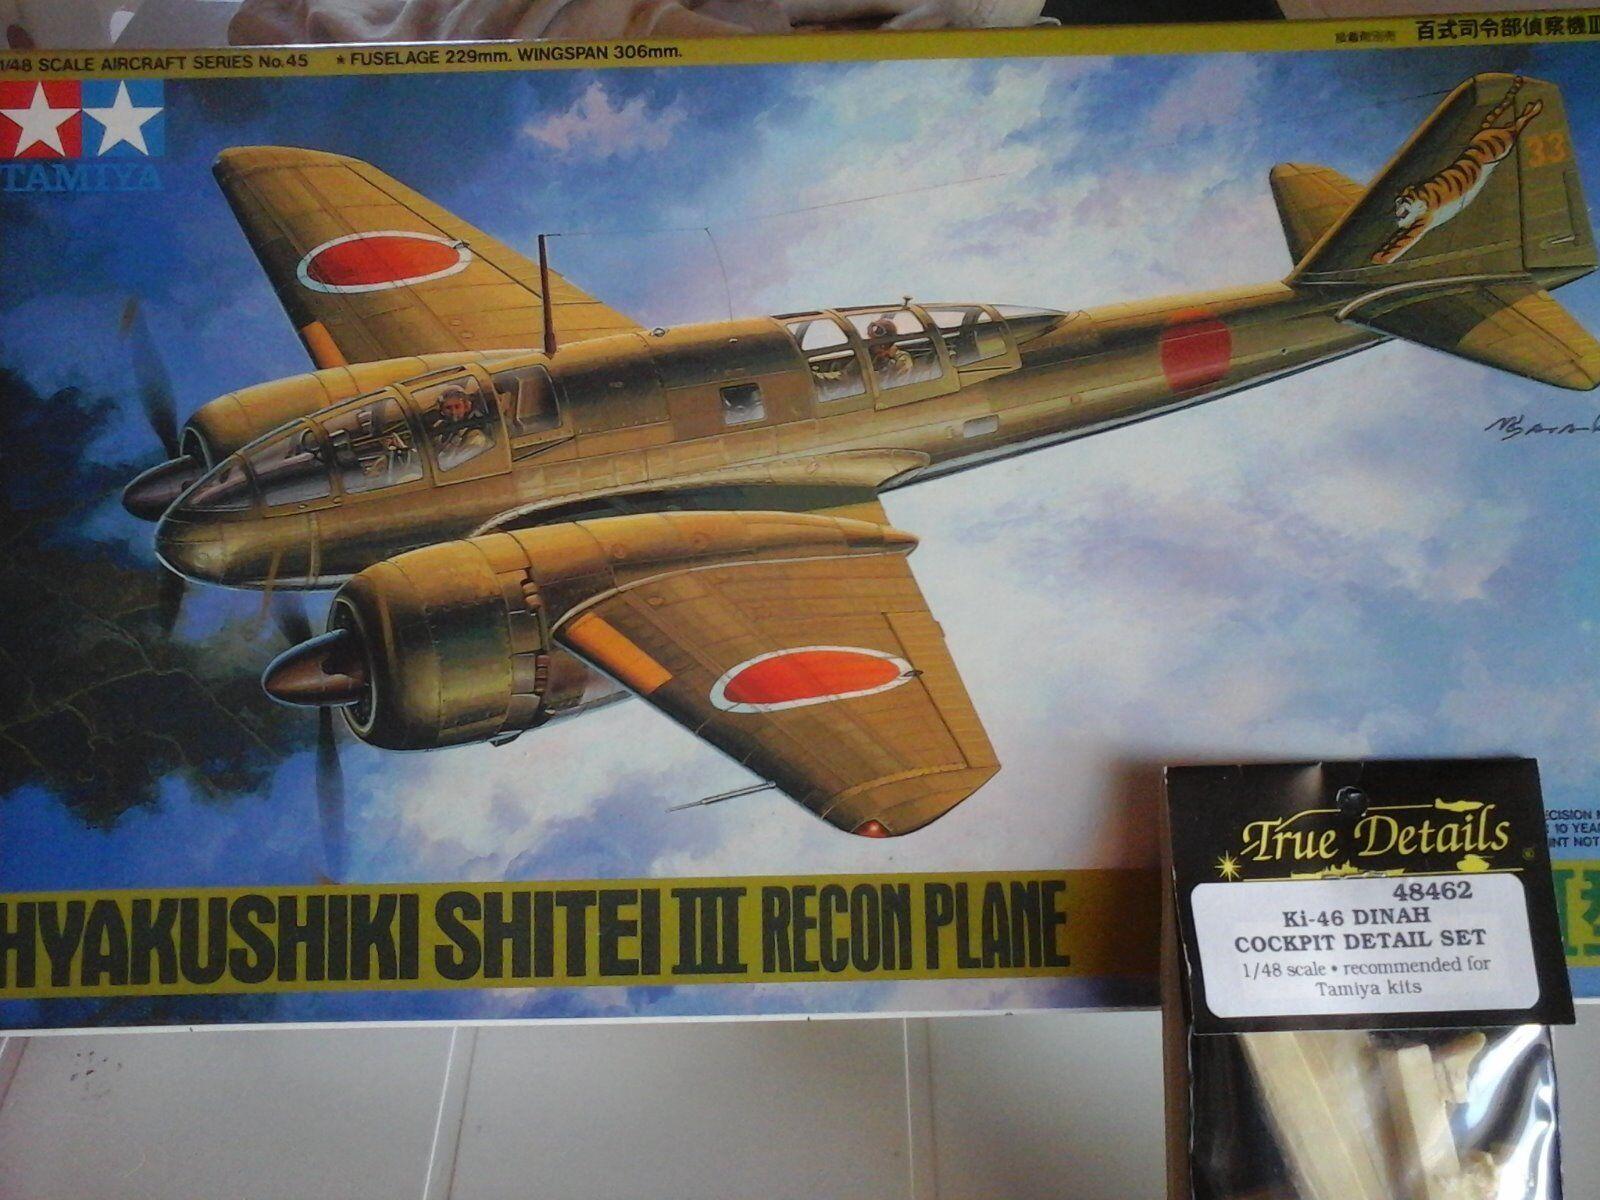 HYAKUSHIKY SHITEI III RECON PLANE 1 48 SCALE TAMIYA MODEL+RESIN COCKPIT DETAIL